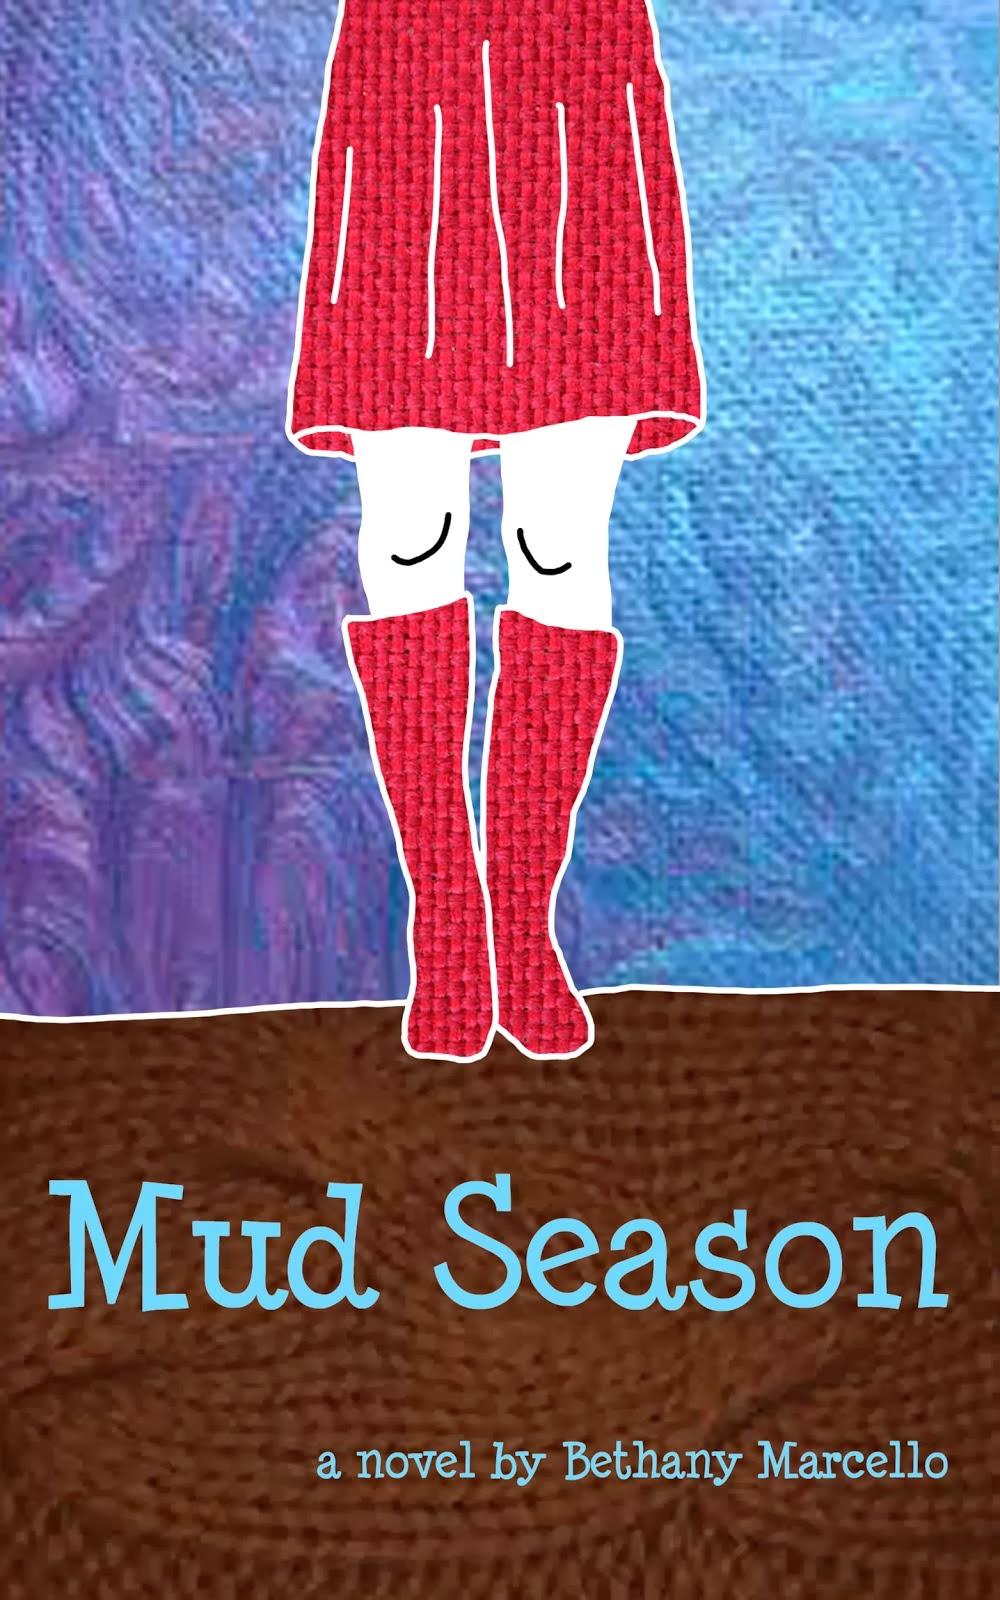 Mud Season